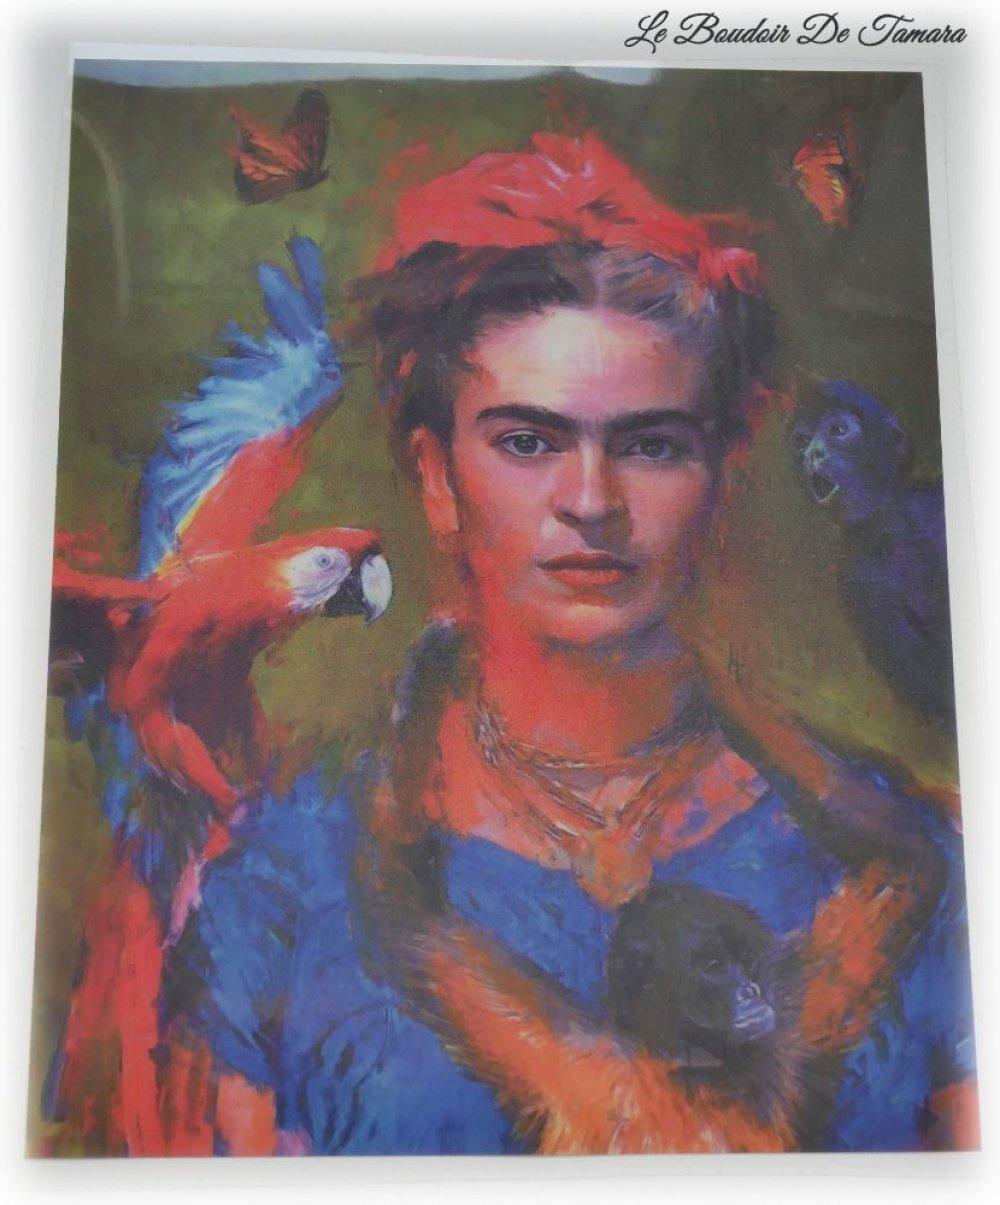 Transfert d'image au fer à repasser Frida Kahlo